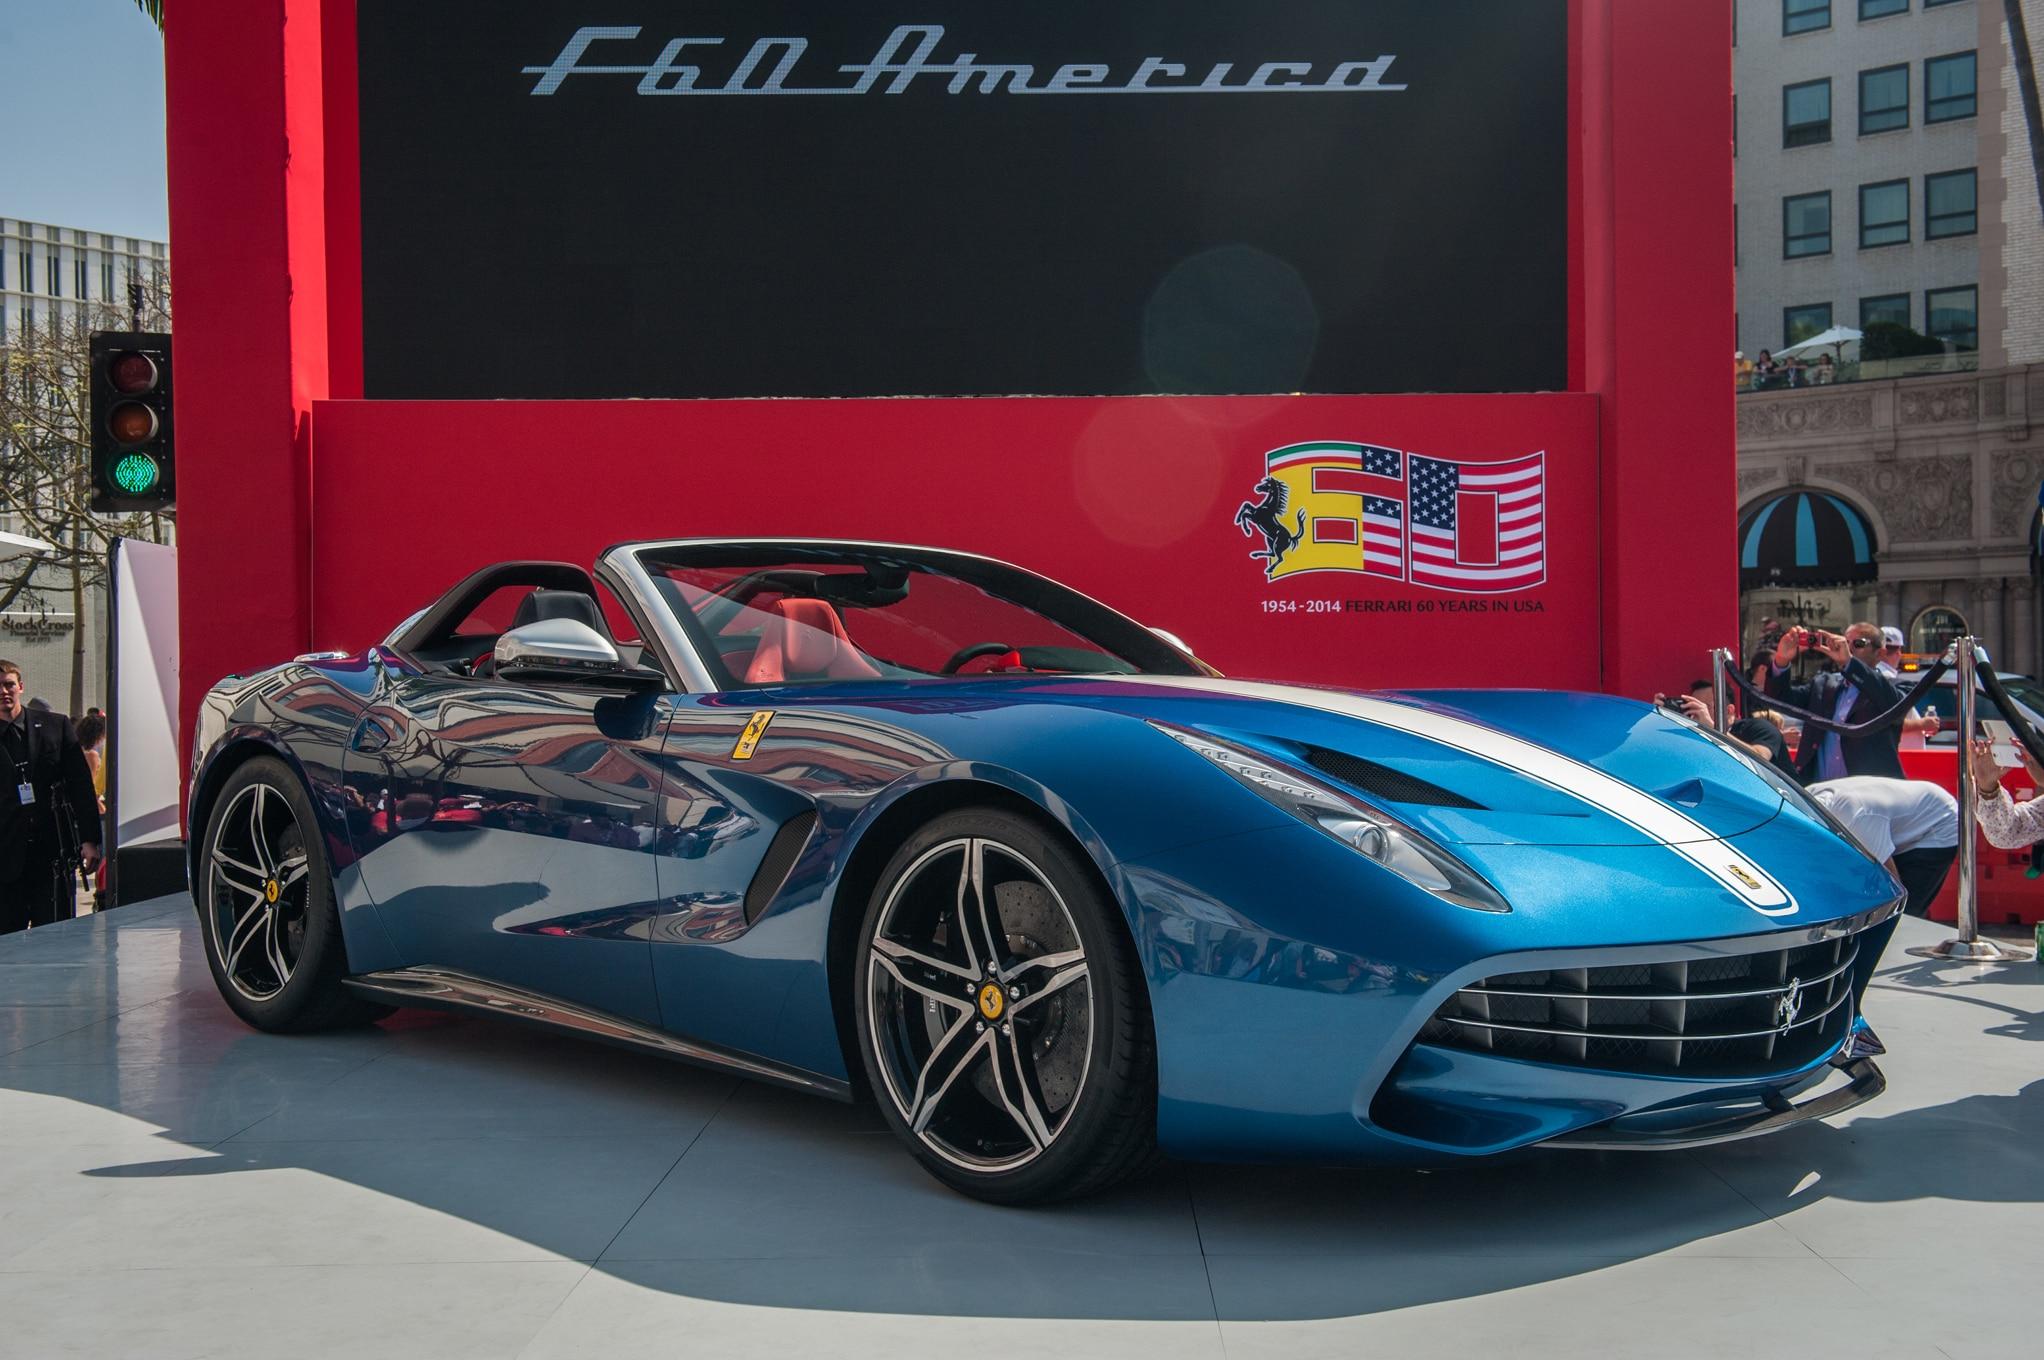 Ferrari Celebrates U.S. Anniversary With F60 America